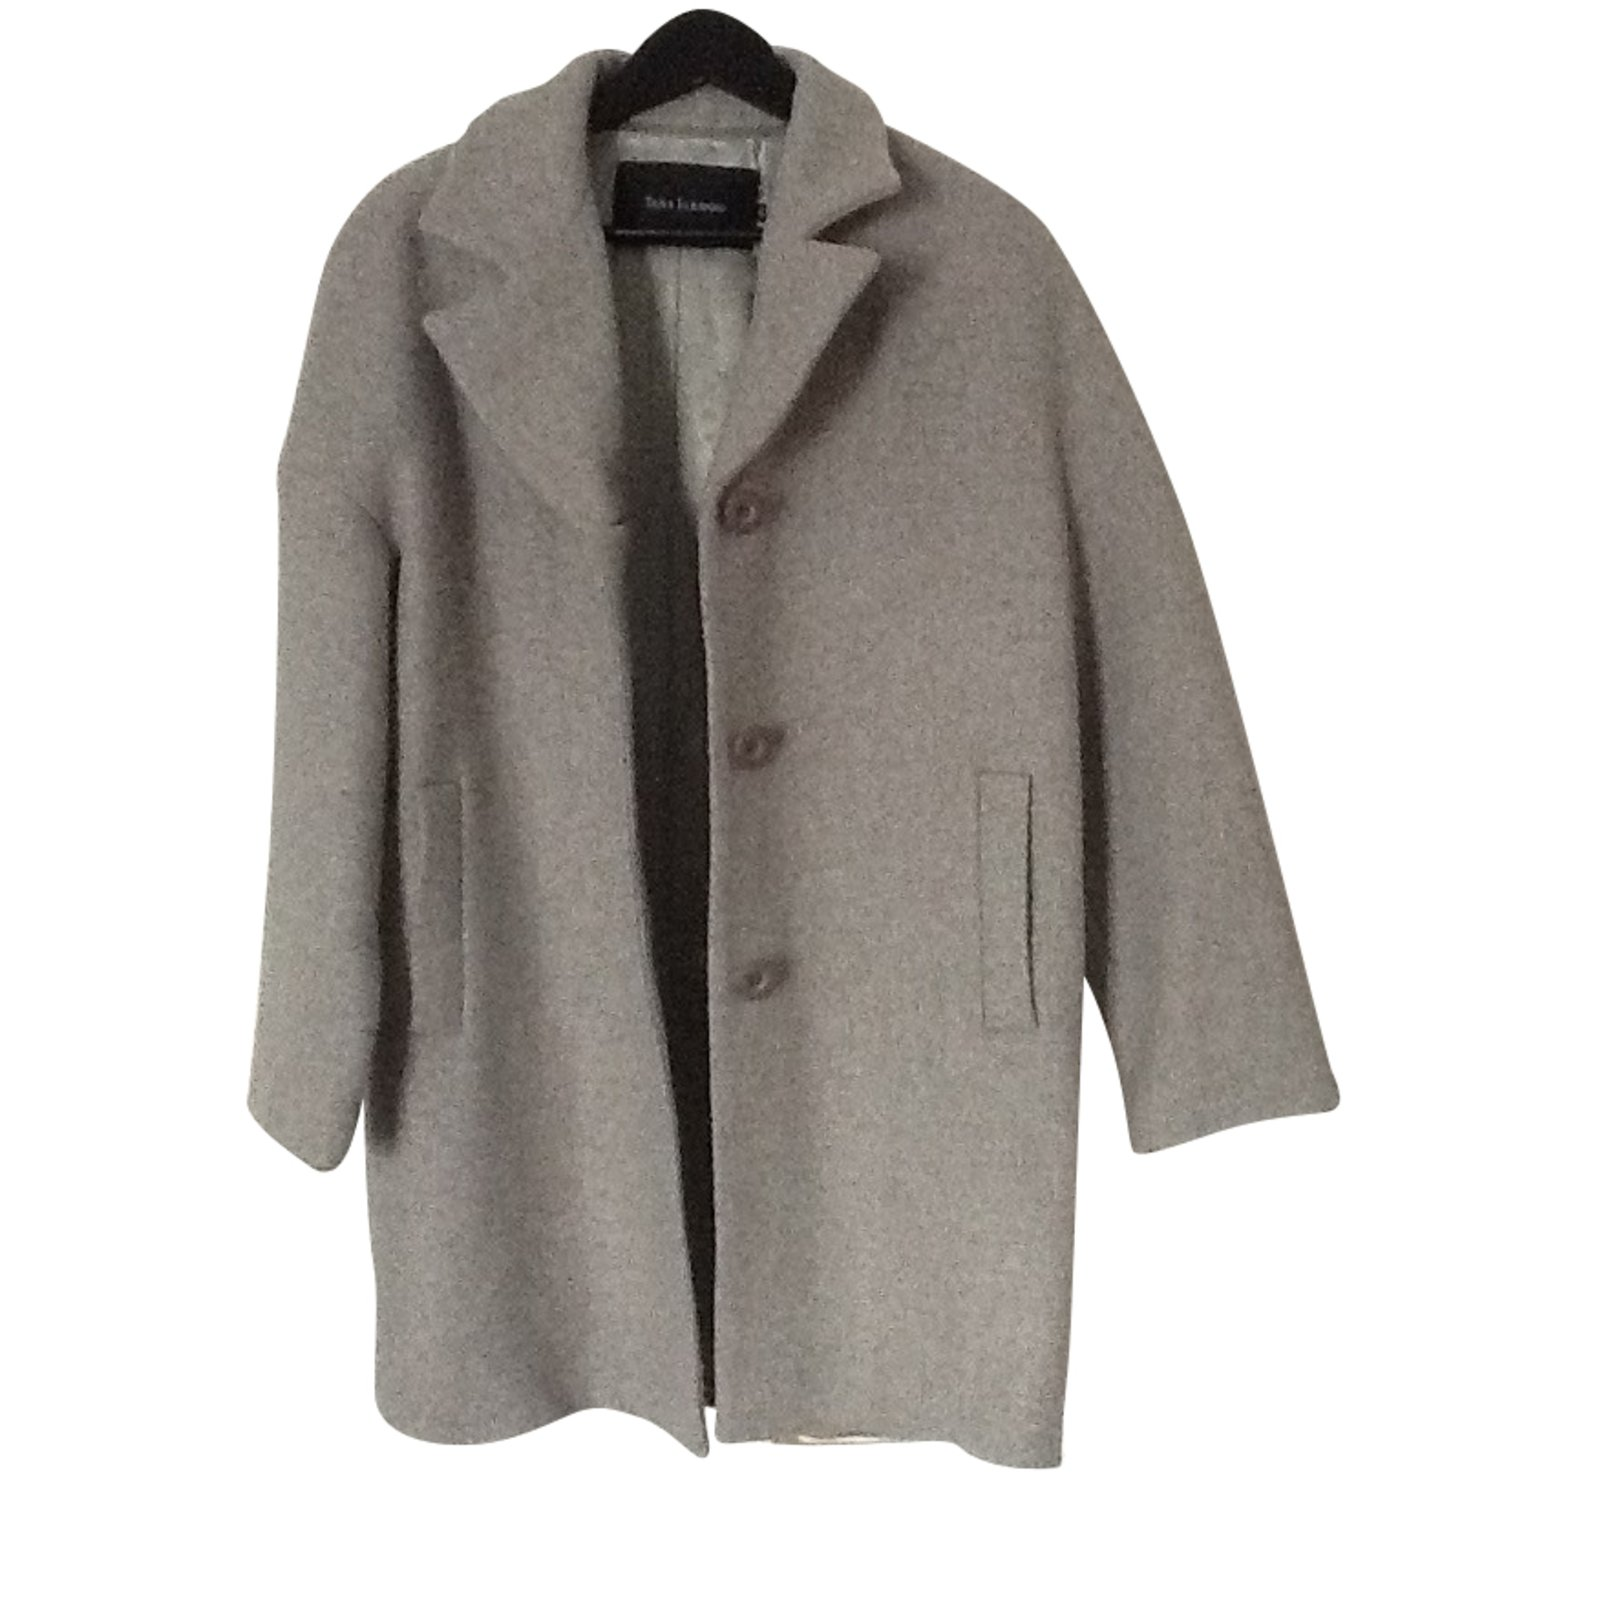 Tara Jarmon Coats Outerwear Wool Grey Ref91626